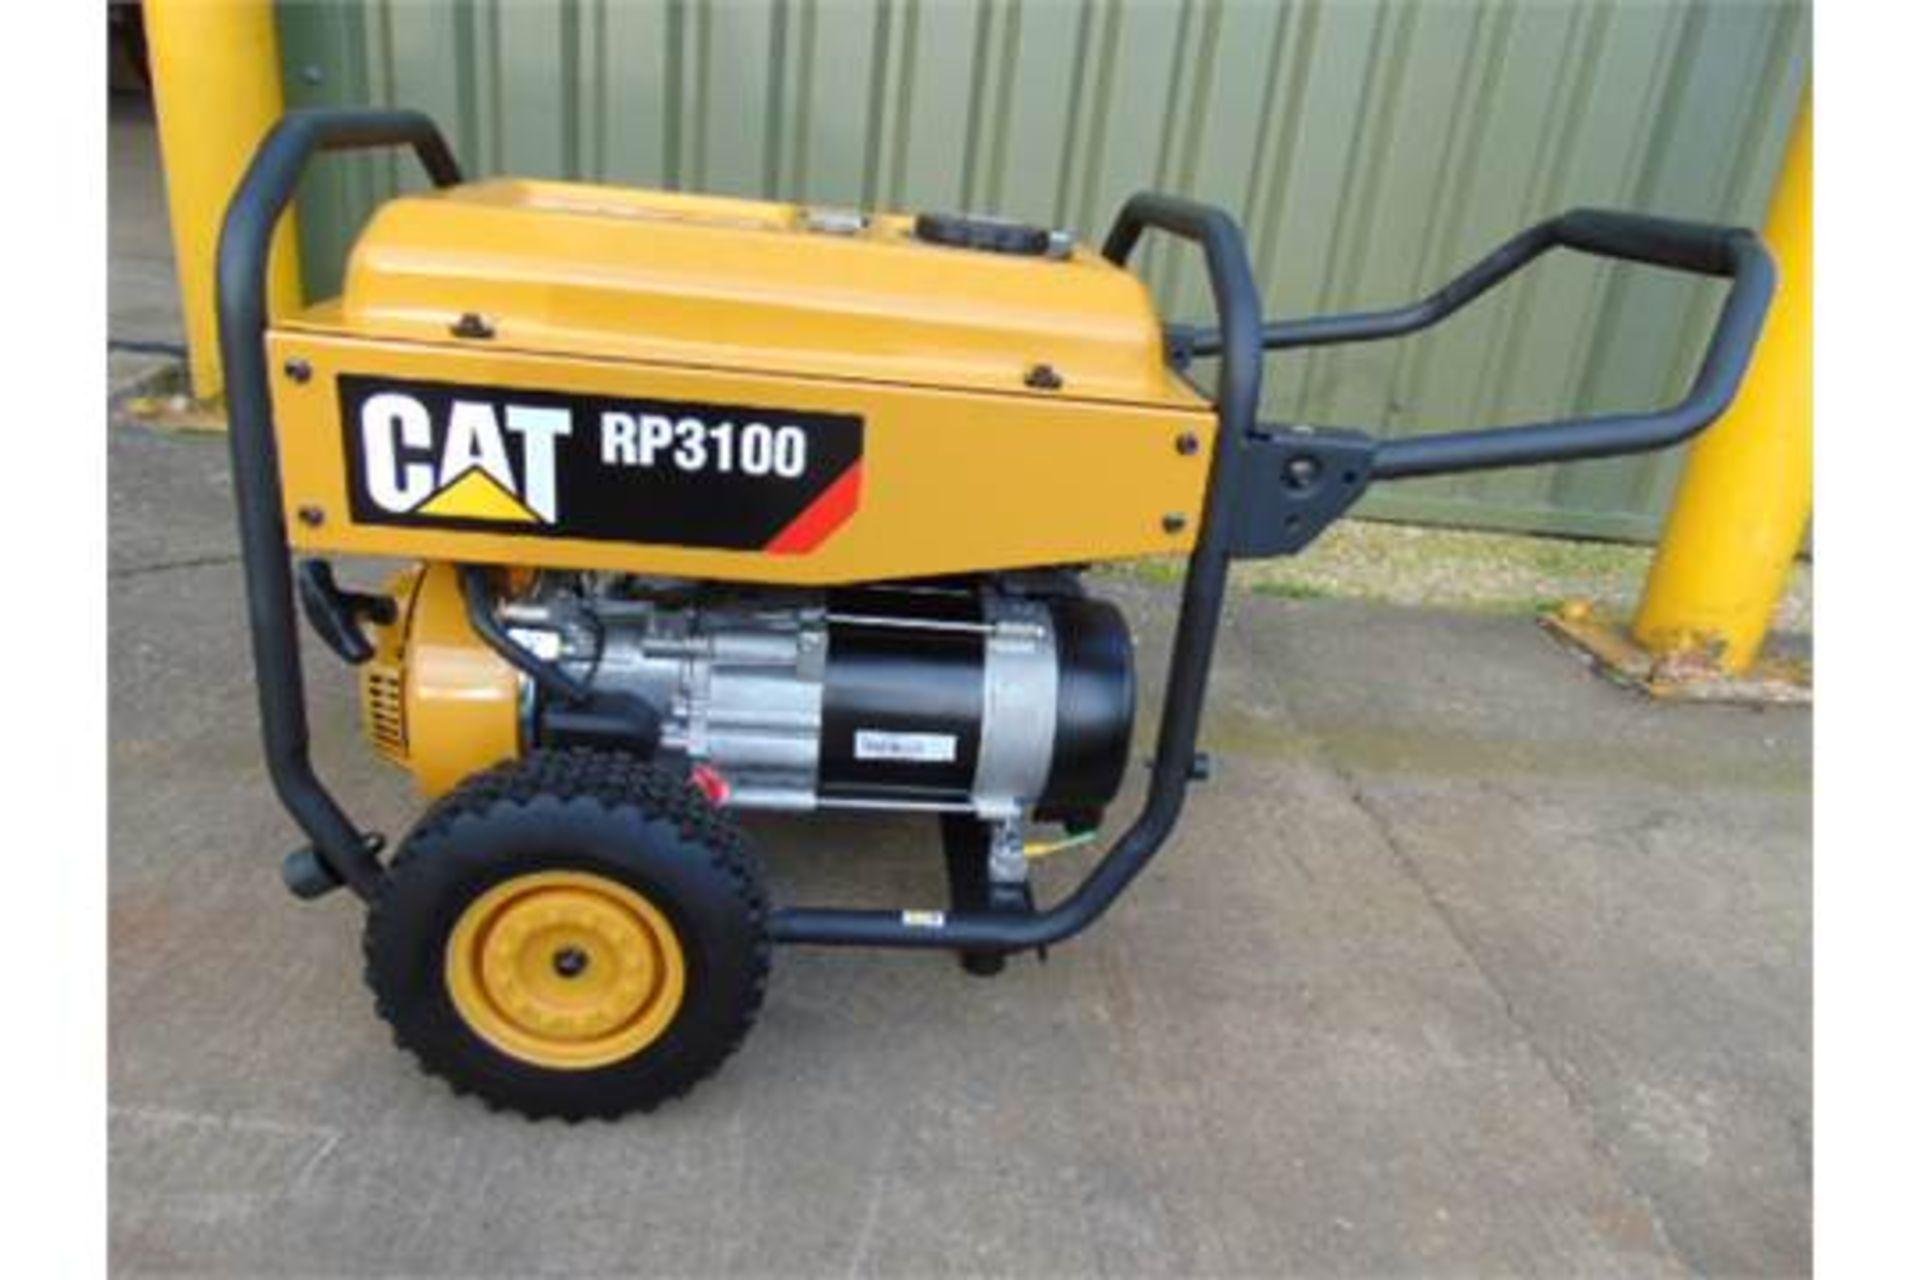 Lot 32 - UNISSUED Caterpillar RP3100 industrial Petrol Generator Set